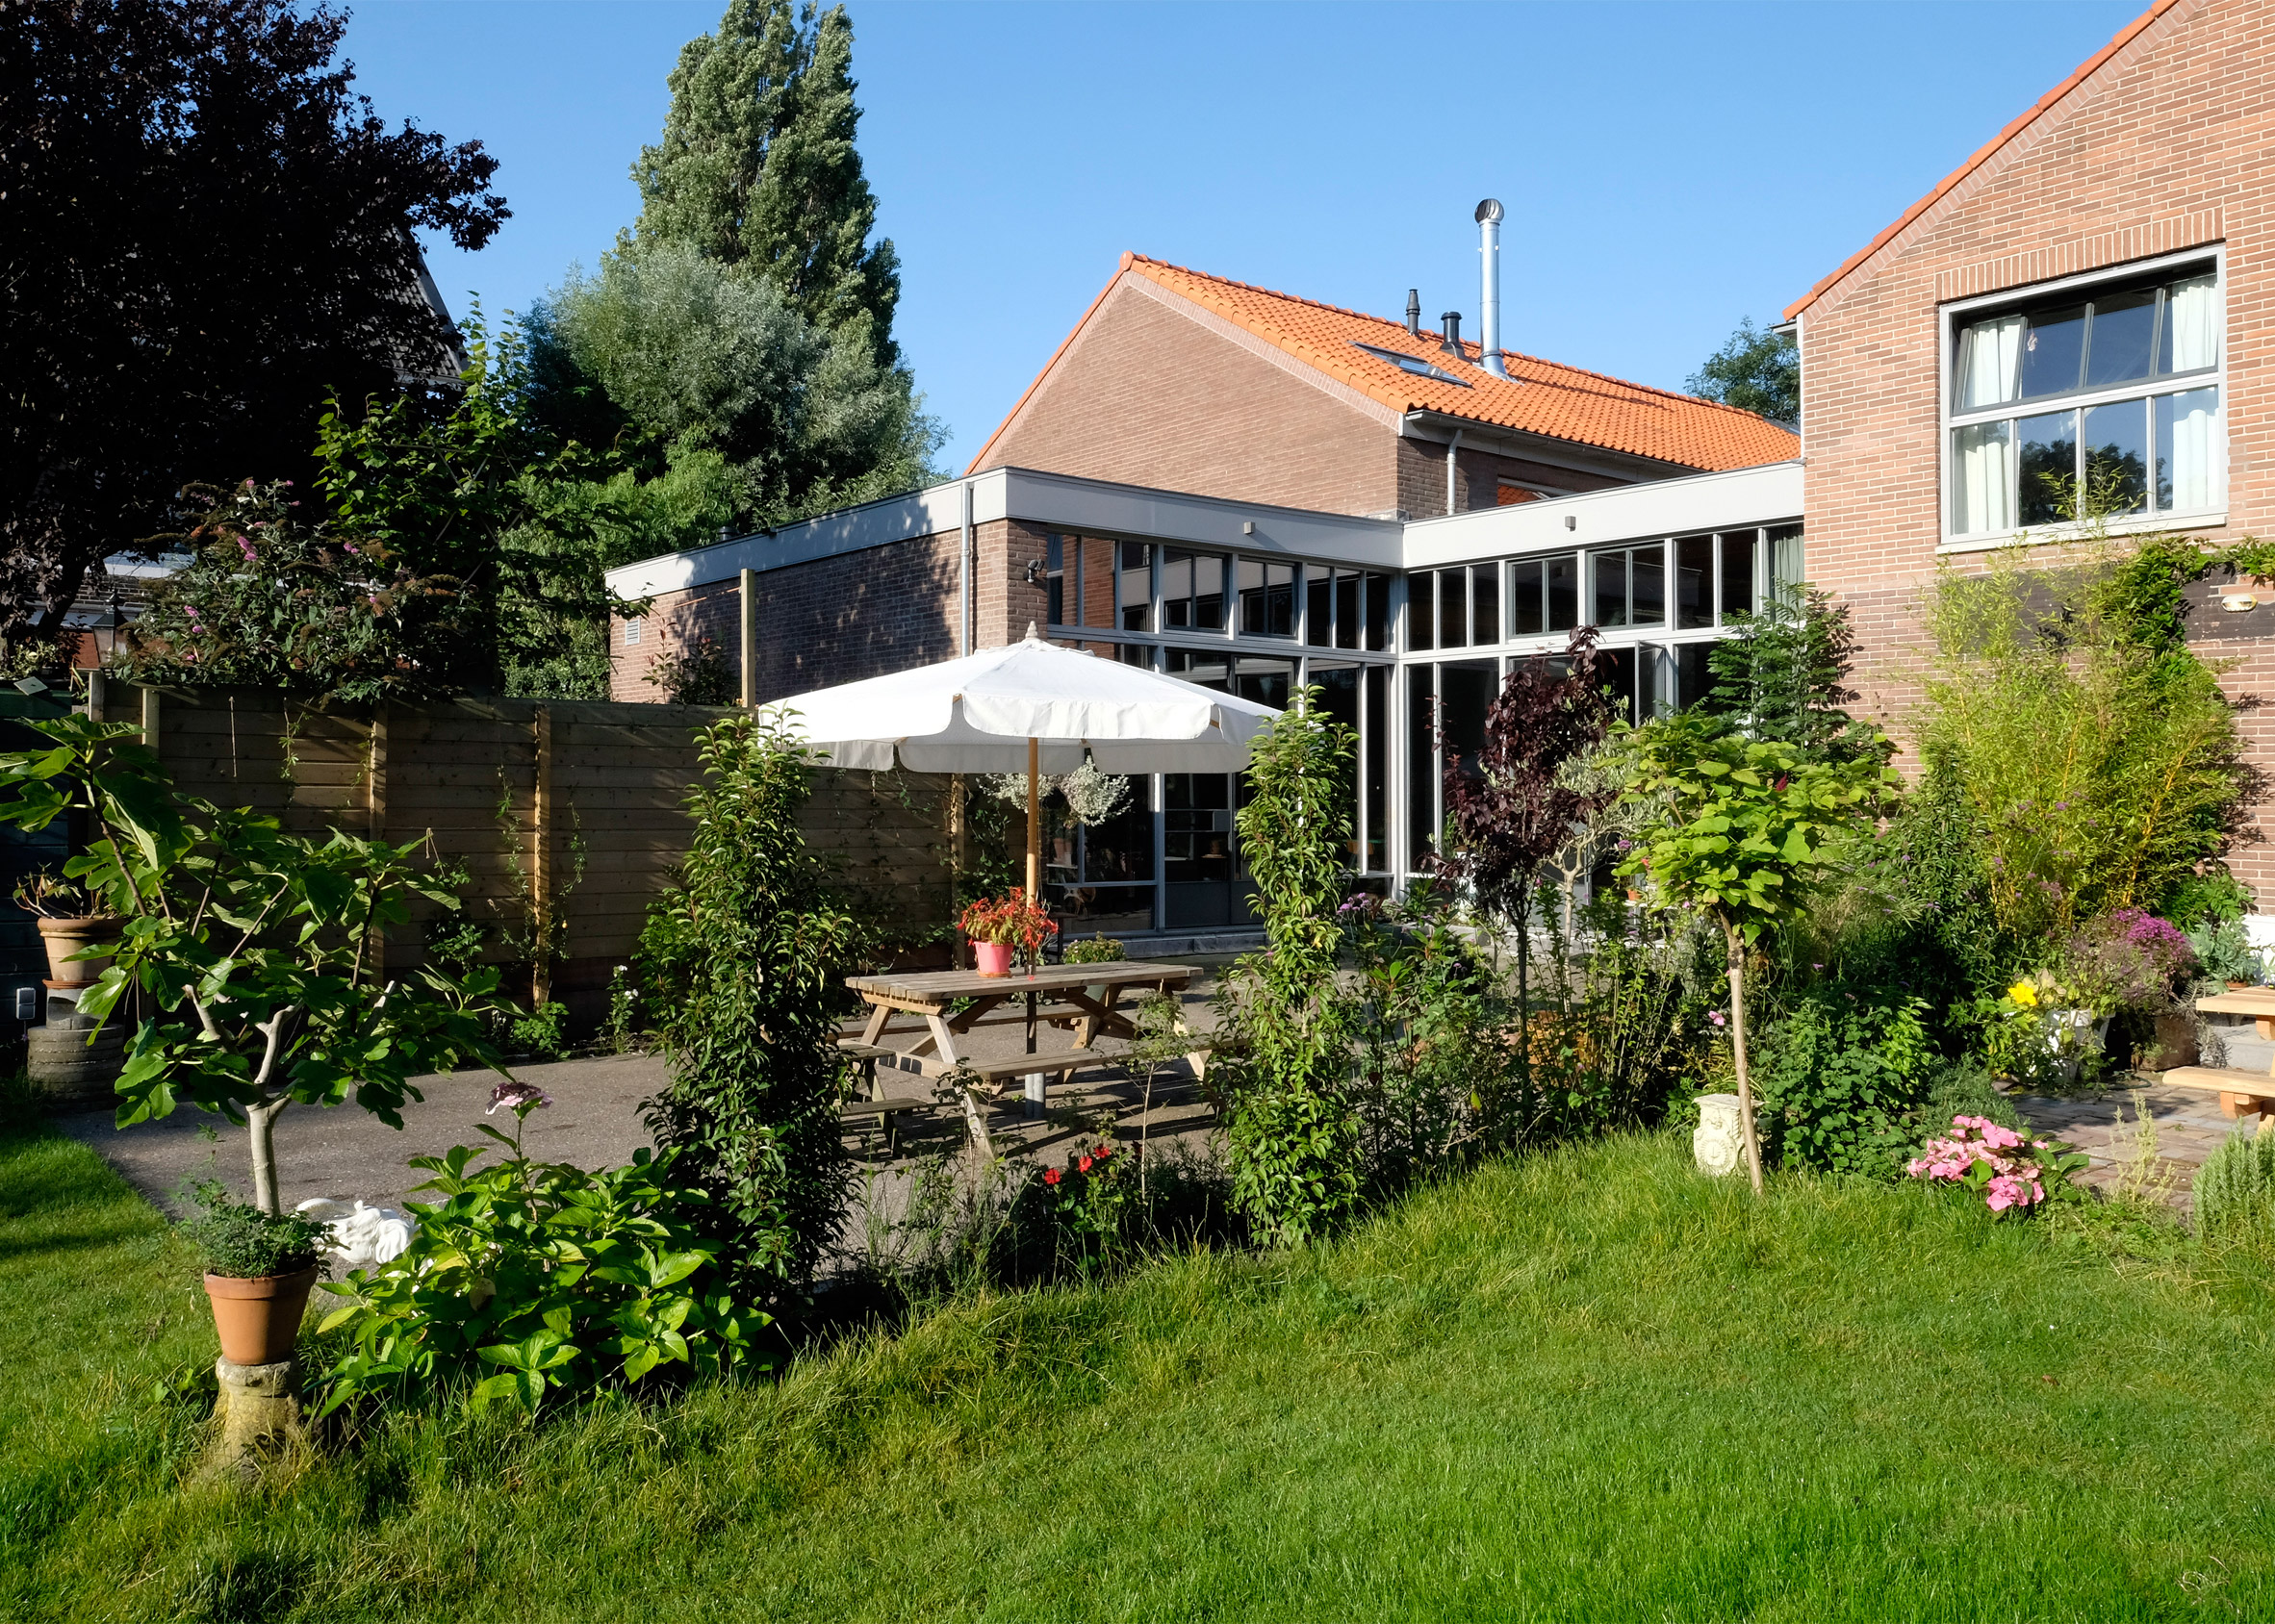 Transformation of former potato barn by Houben & Van Mierlo